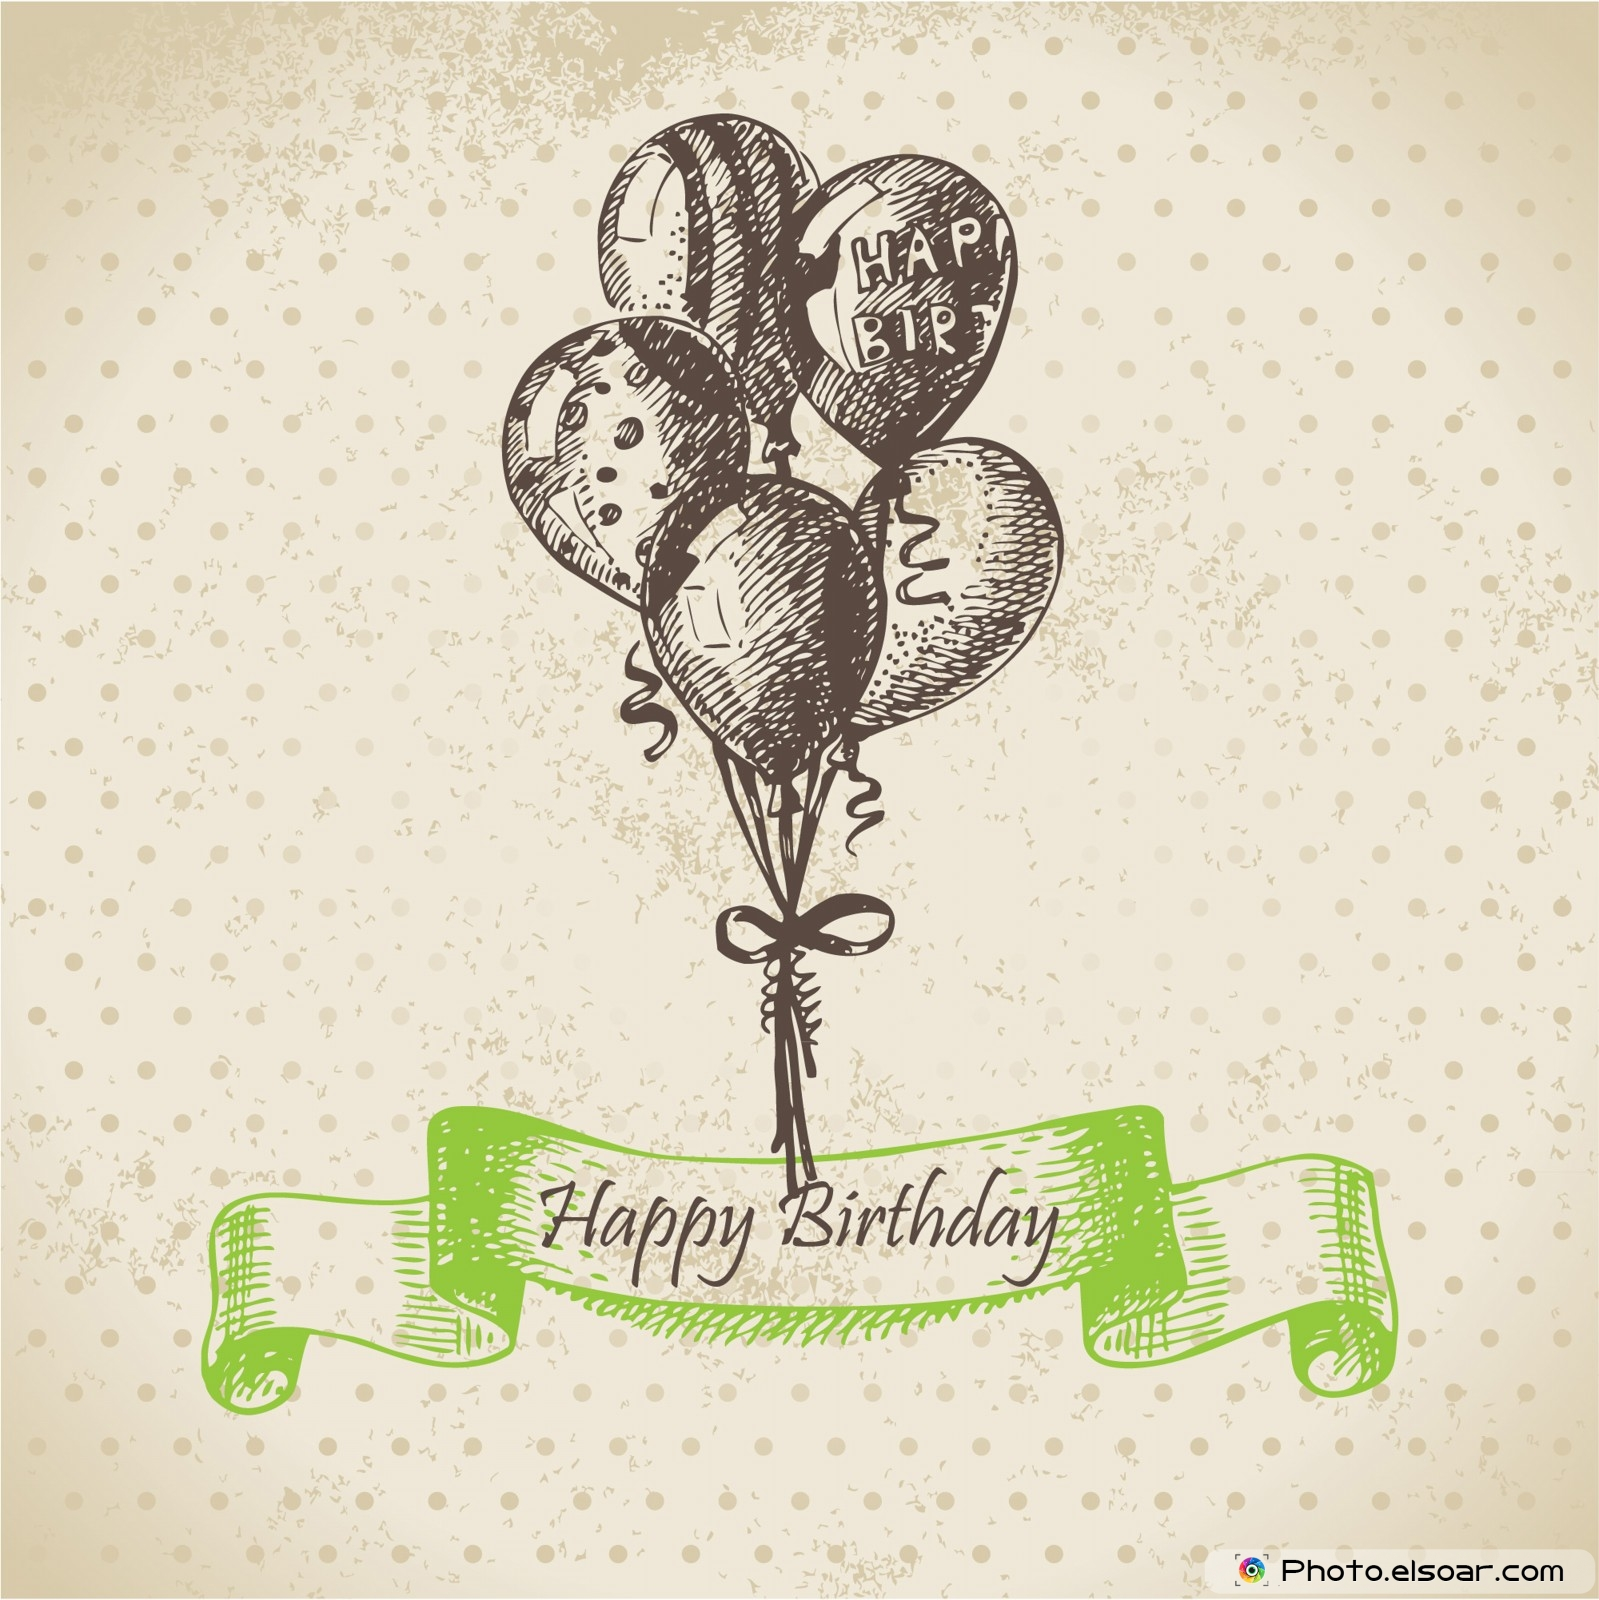 Drawn birthday Happy Cards Happy 22 Birthday